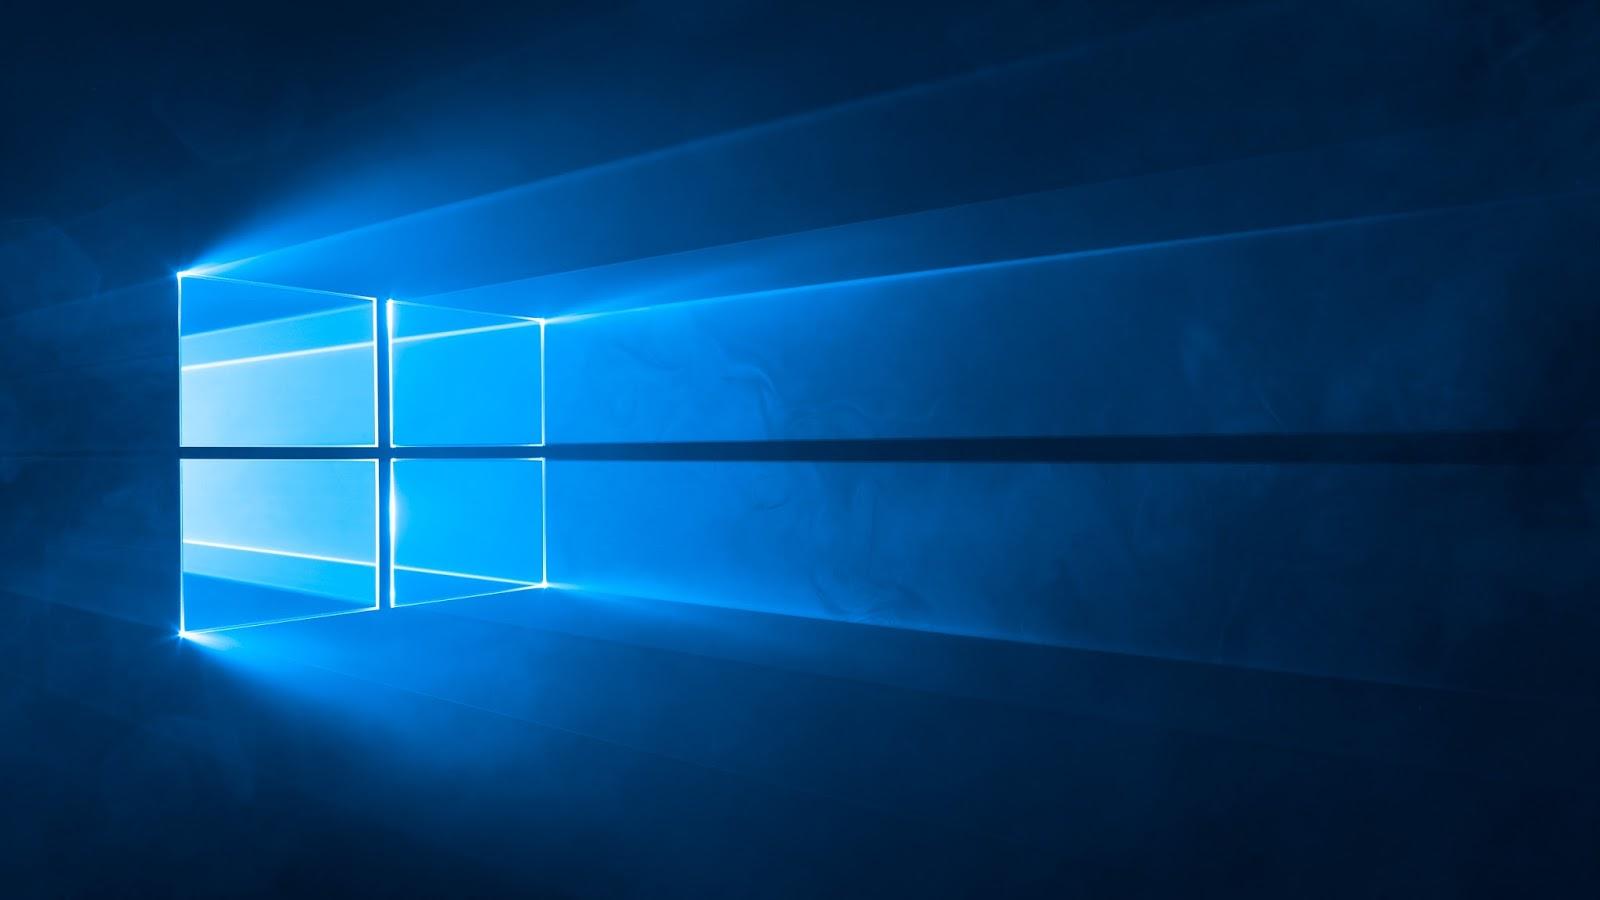 44 Download Wallpaper Windows 10 On Wallpapersafari